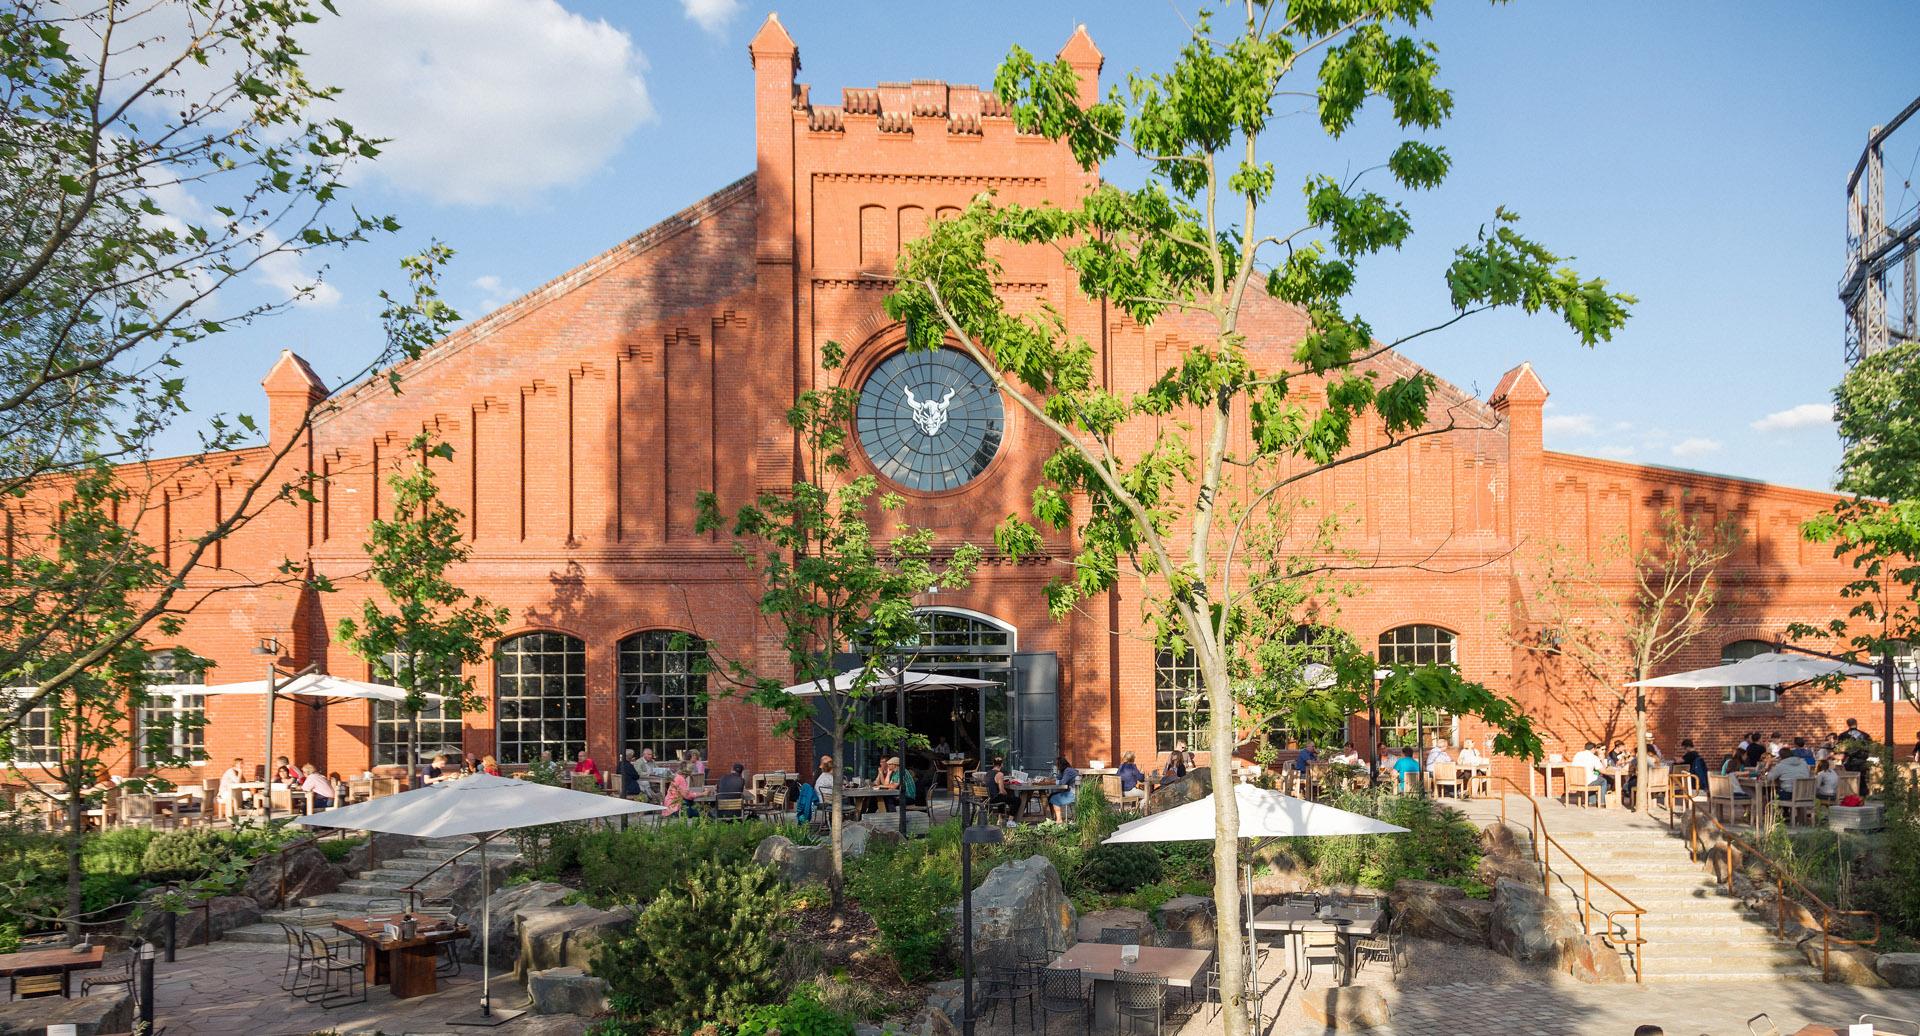 Brauereien Berlin